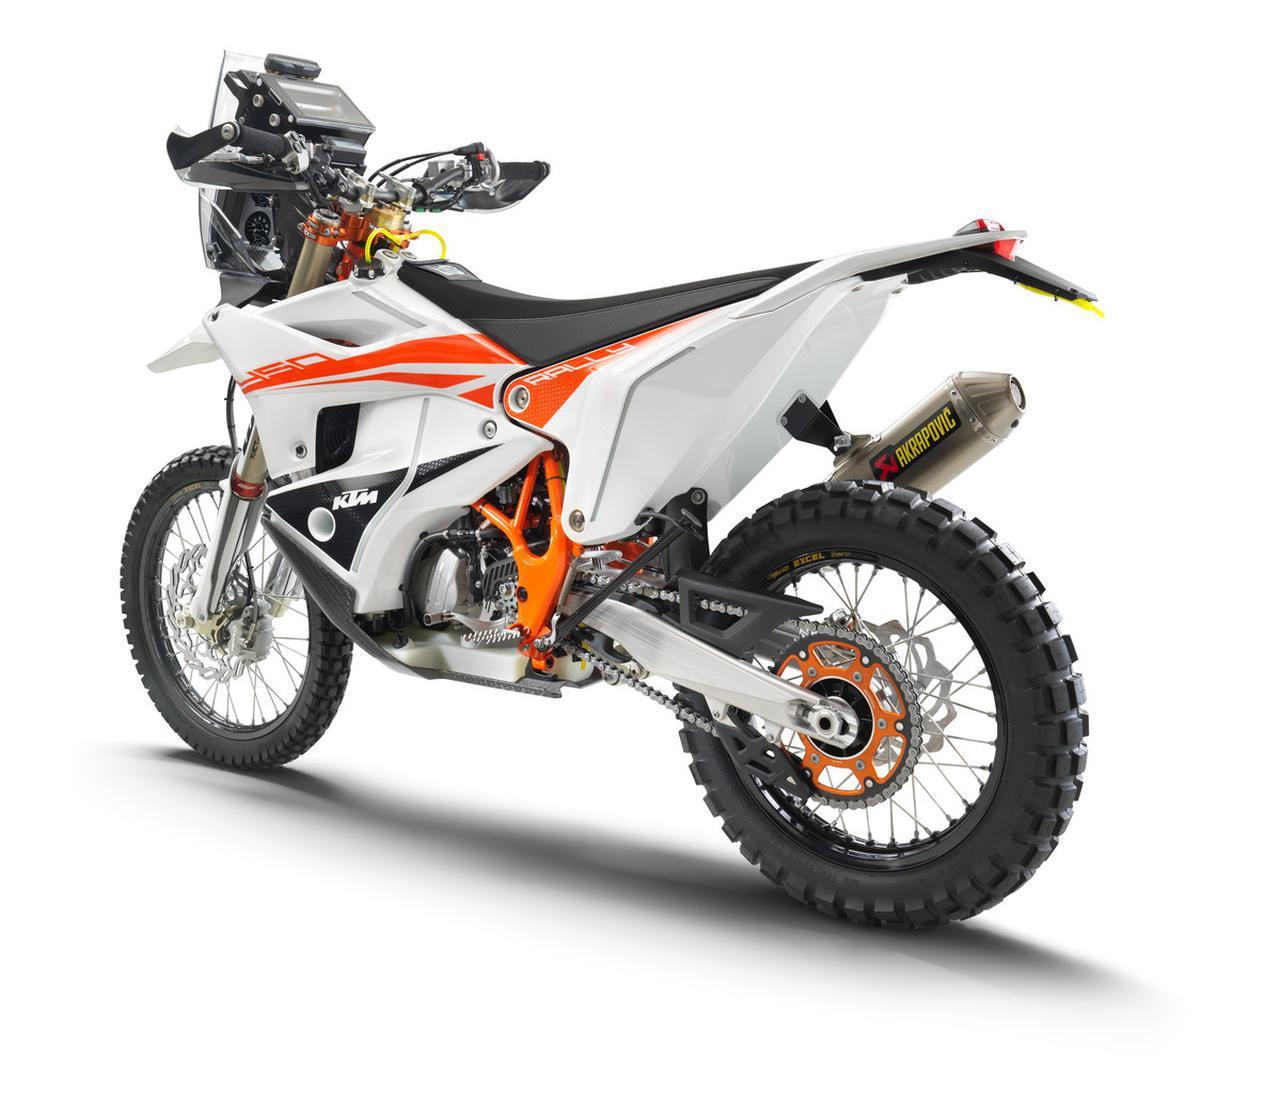 画像2: KTM 450RALLY FACTORY REPLICA EUR 25,900(欧州価格)